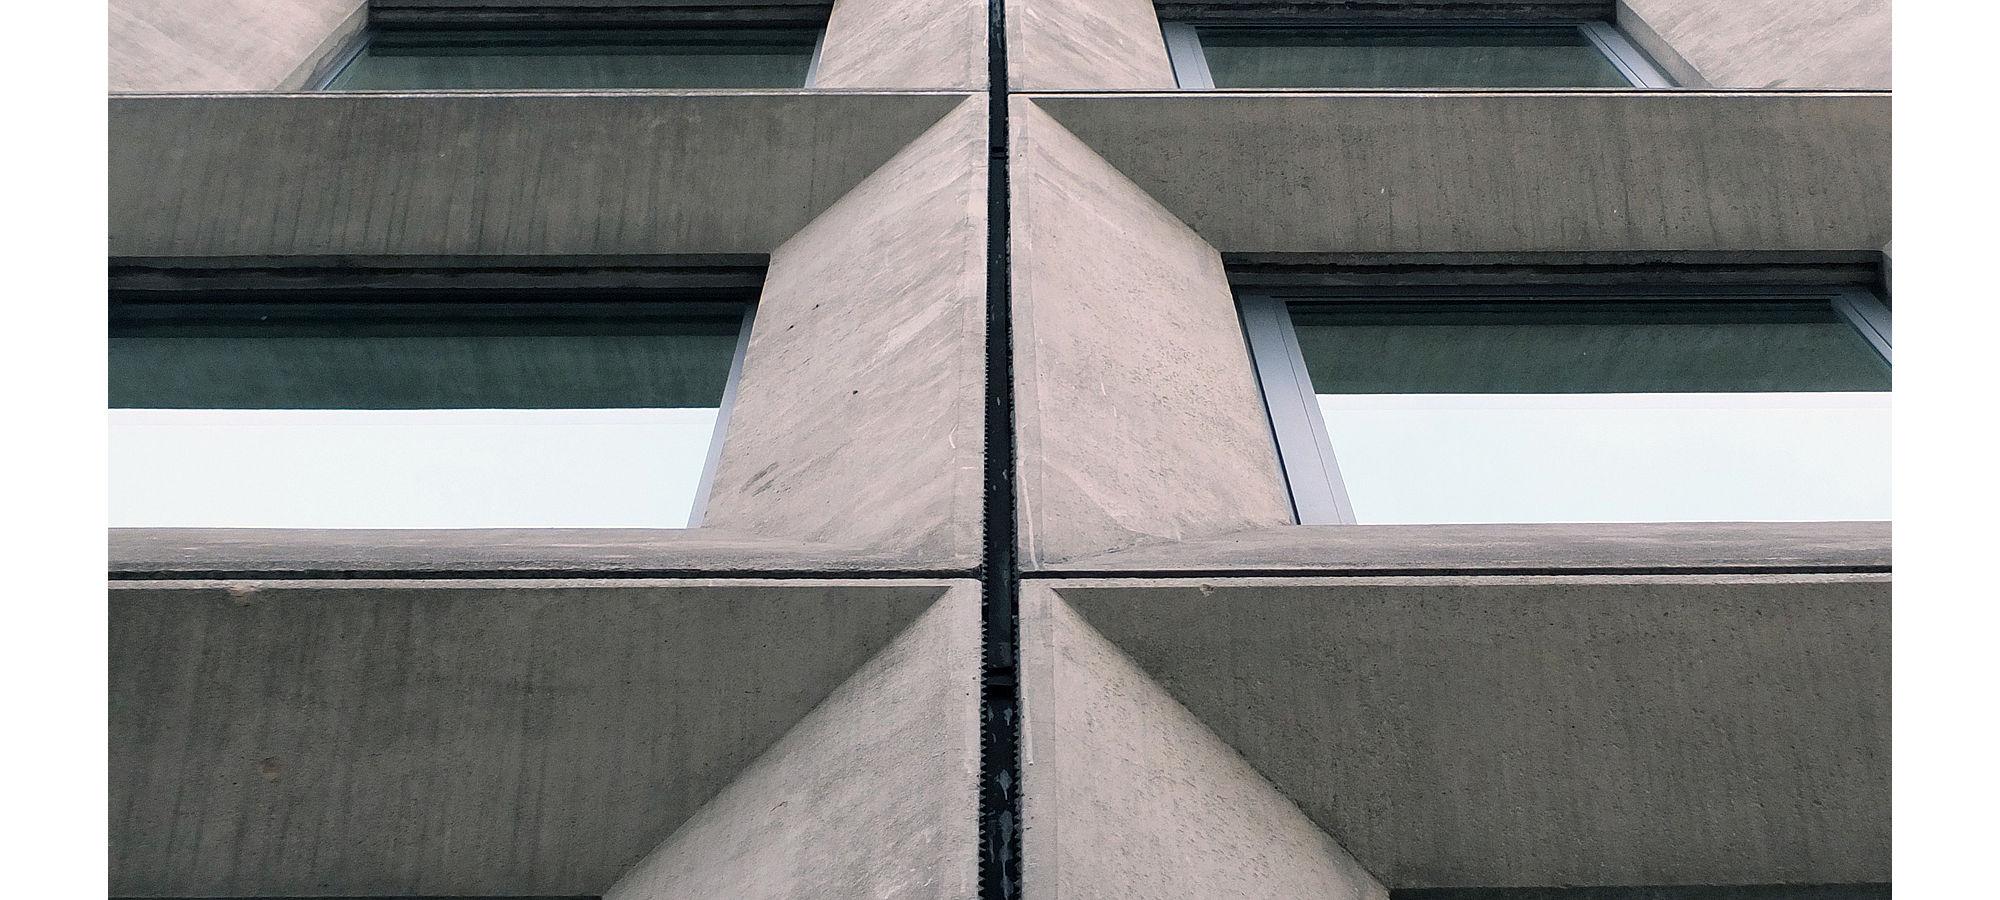 Geometric angular concrete windows